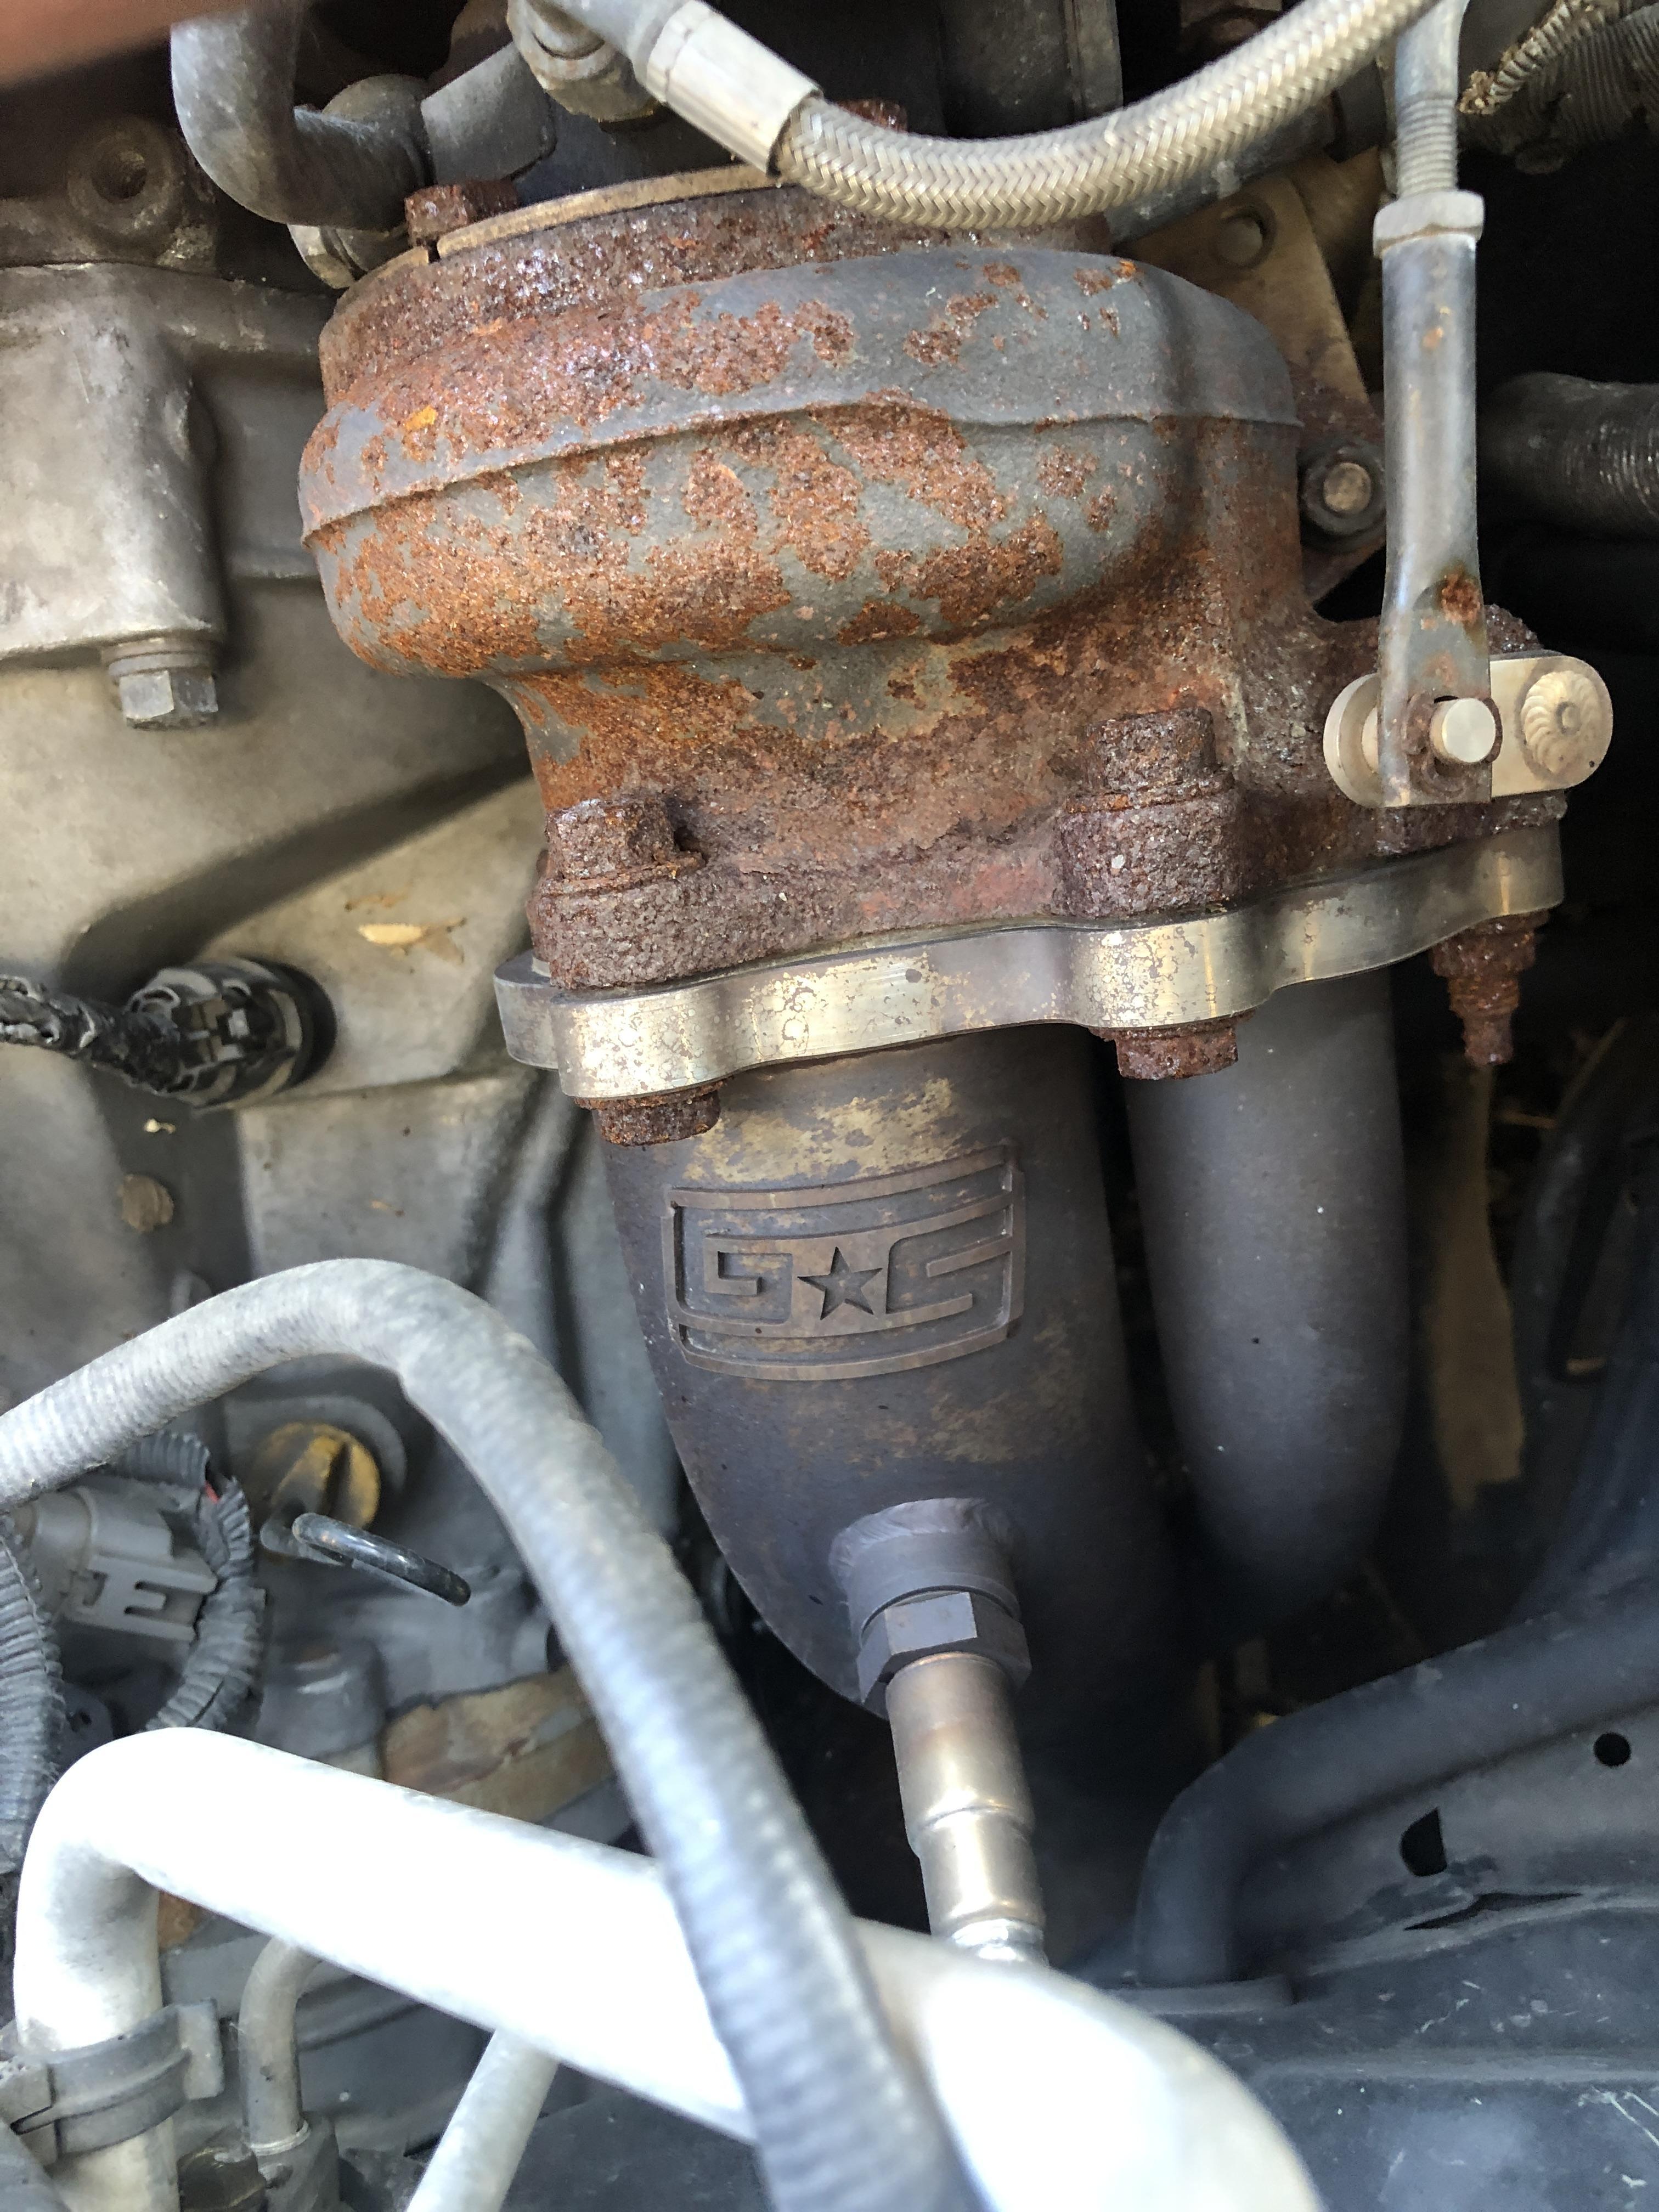 New car need some help-66061b8a-f45c-4d46-b120-7da021ac79c6_1572020113066-jpeg